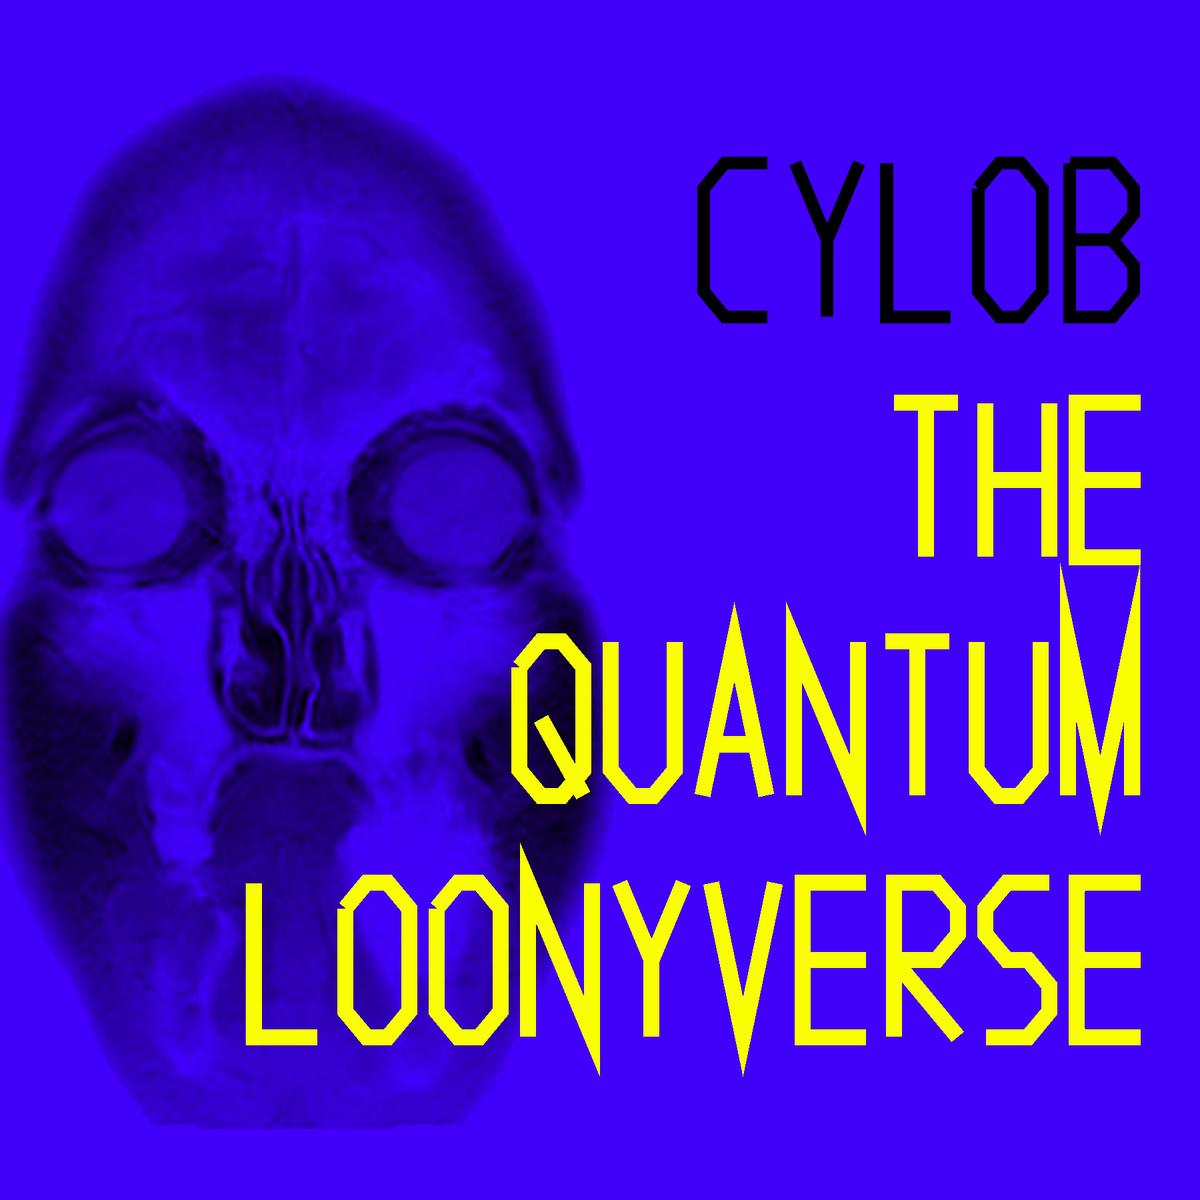 cylob-the-quantum-loonyverse